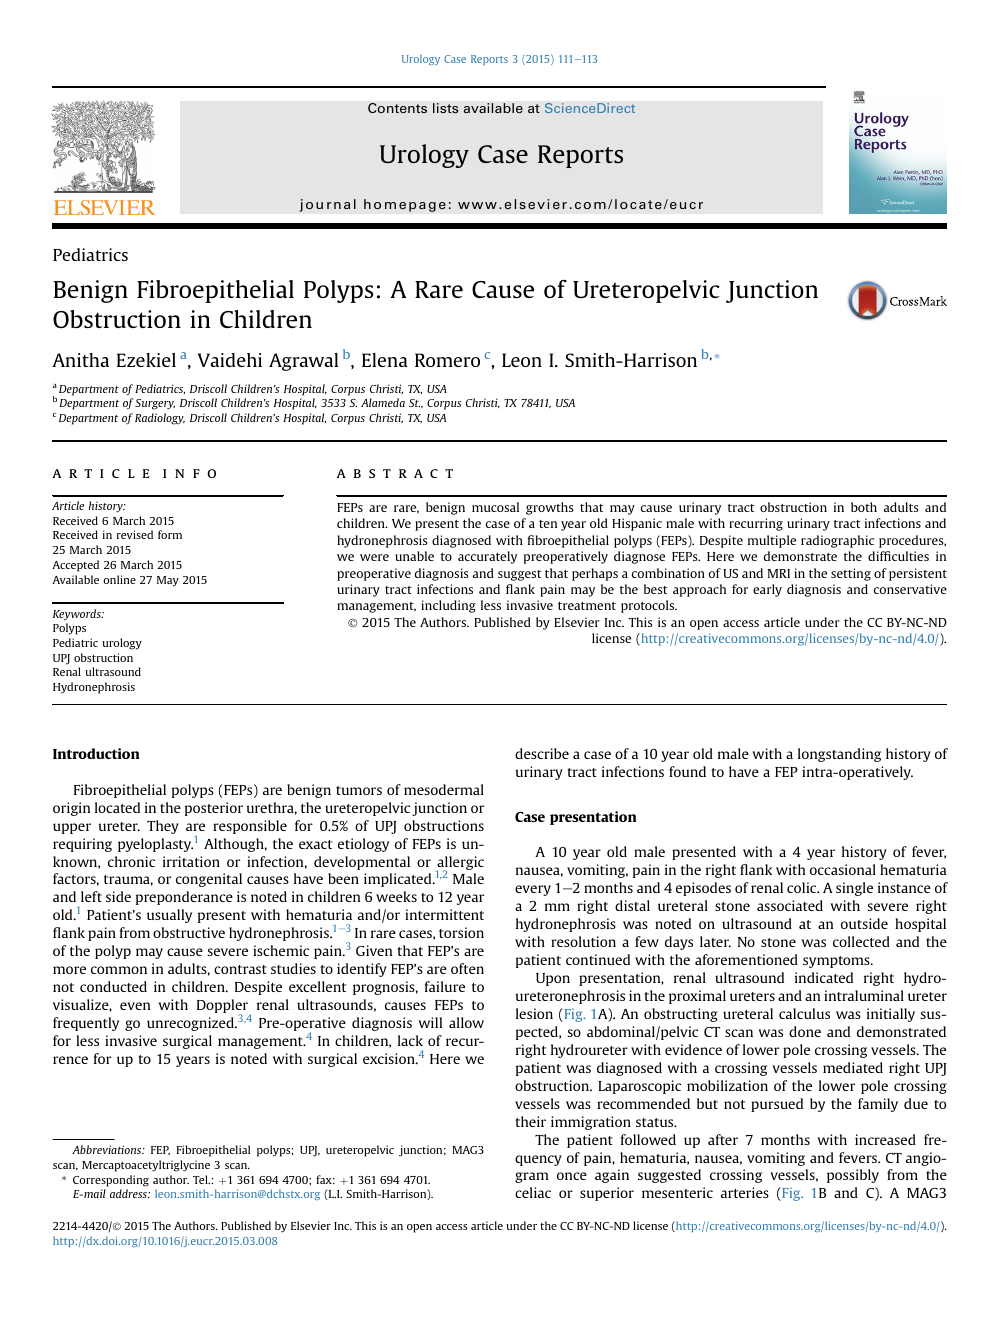 Benign Fibroepithelial Polyps: A Rare Cause of Ureteropelvic